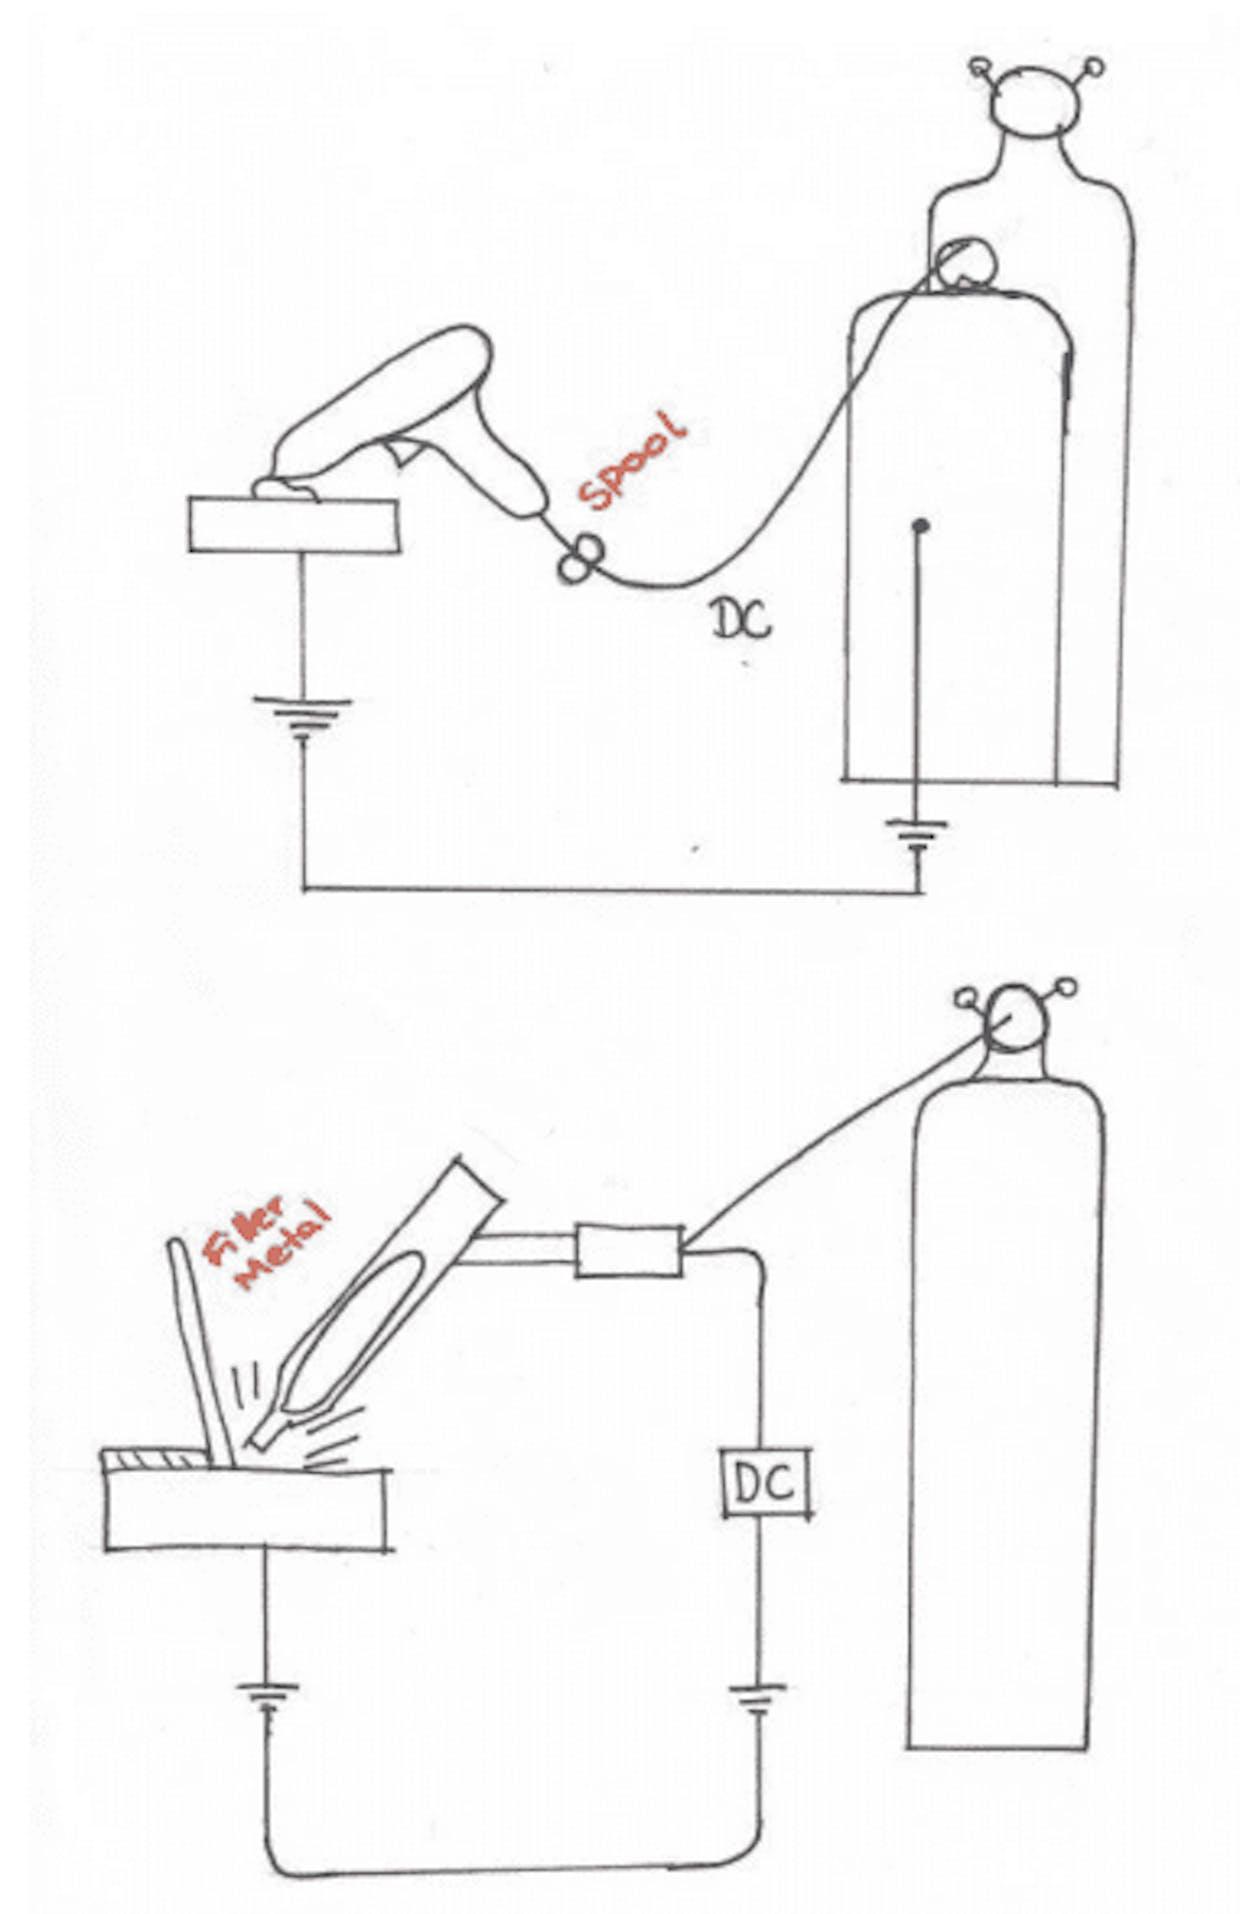 Mig Tig Welding Engineering Notes